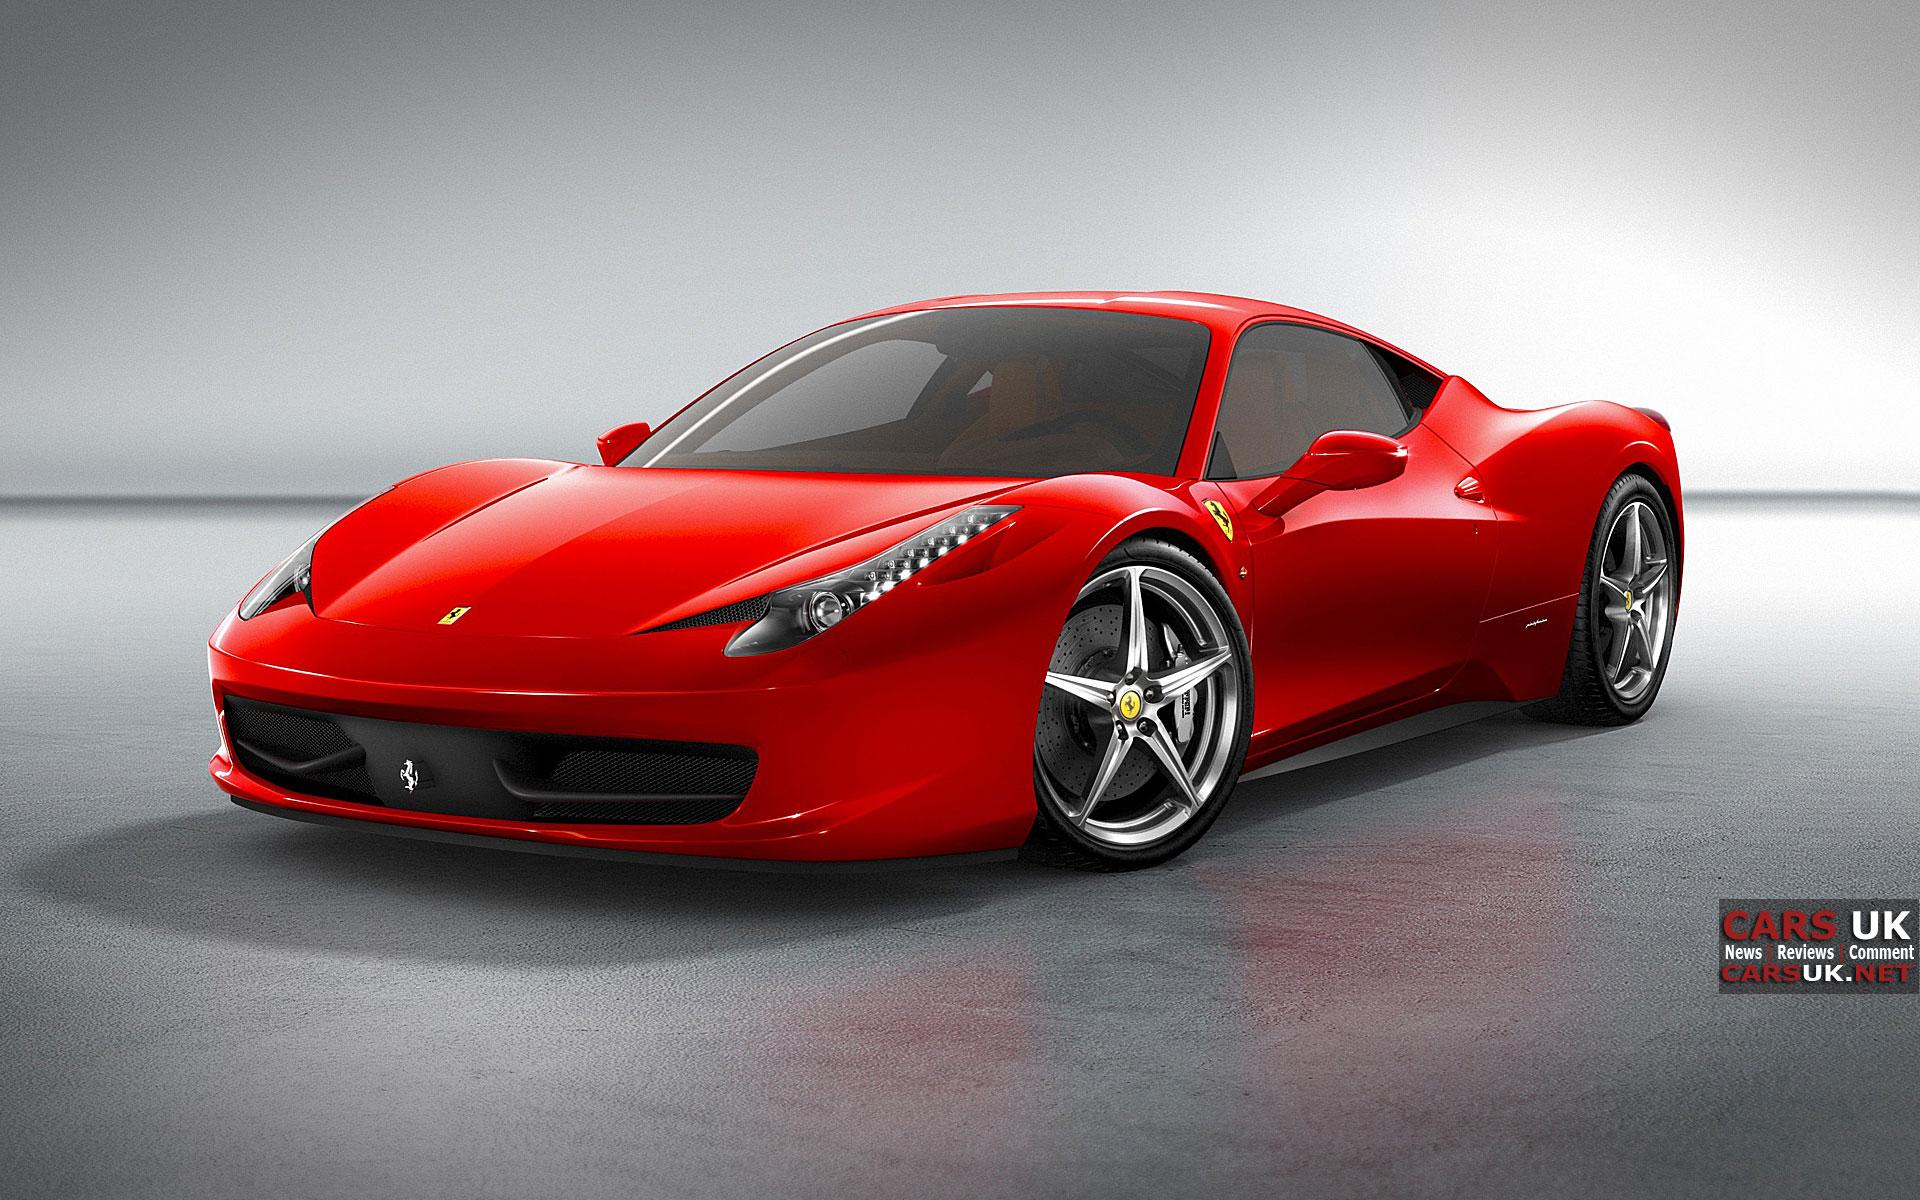 Ferrari 458 Italia Wallpaper Hd wallpaper   2966 1920x1200